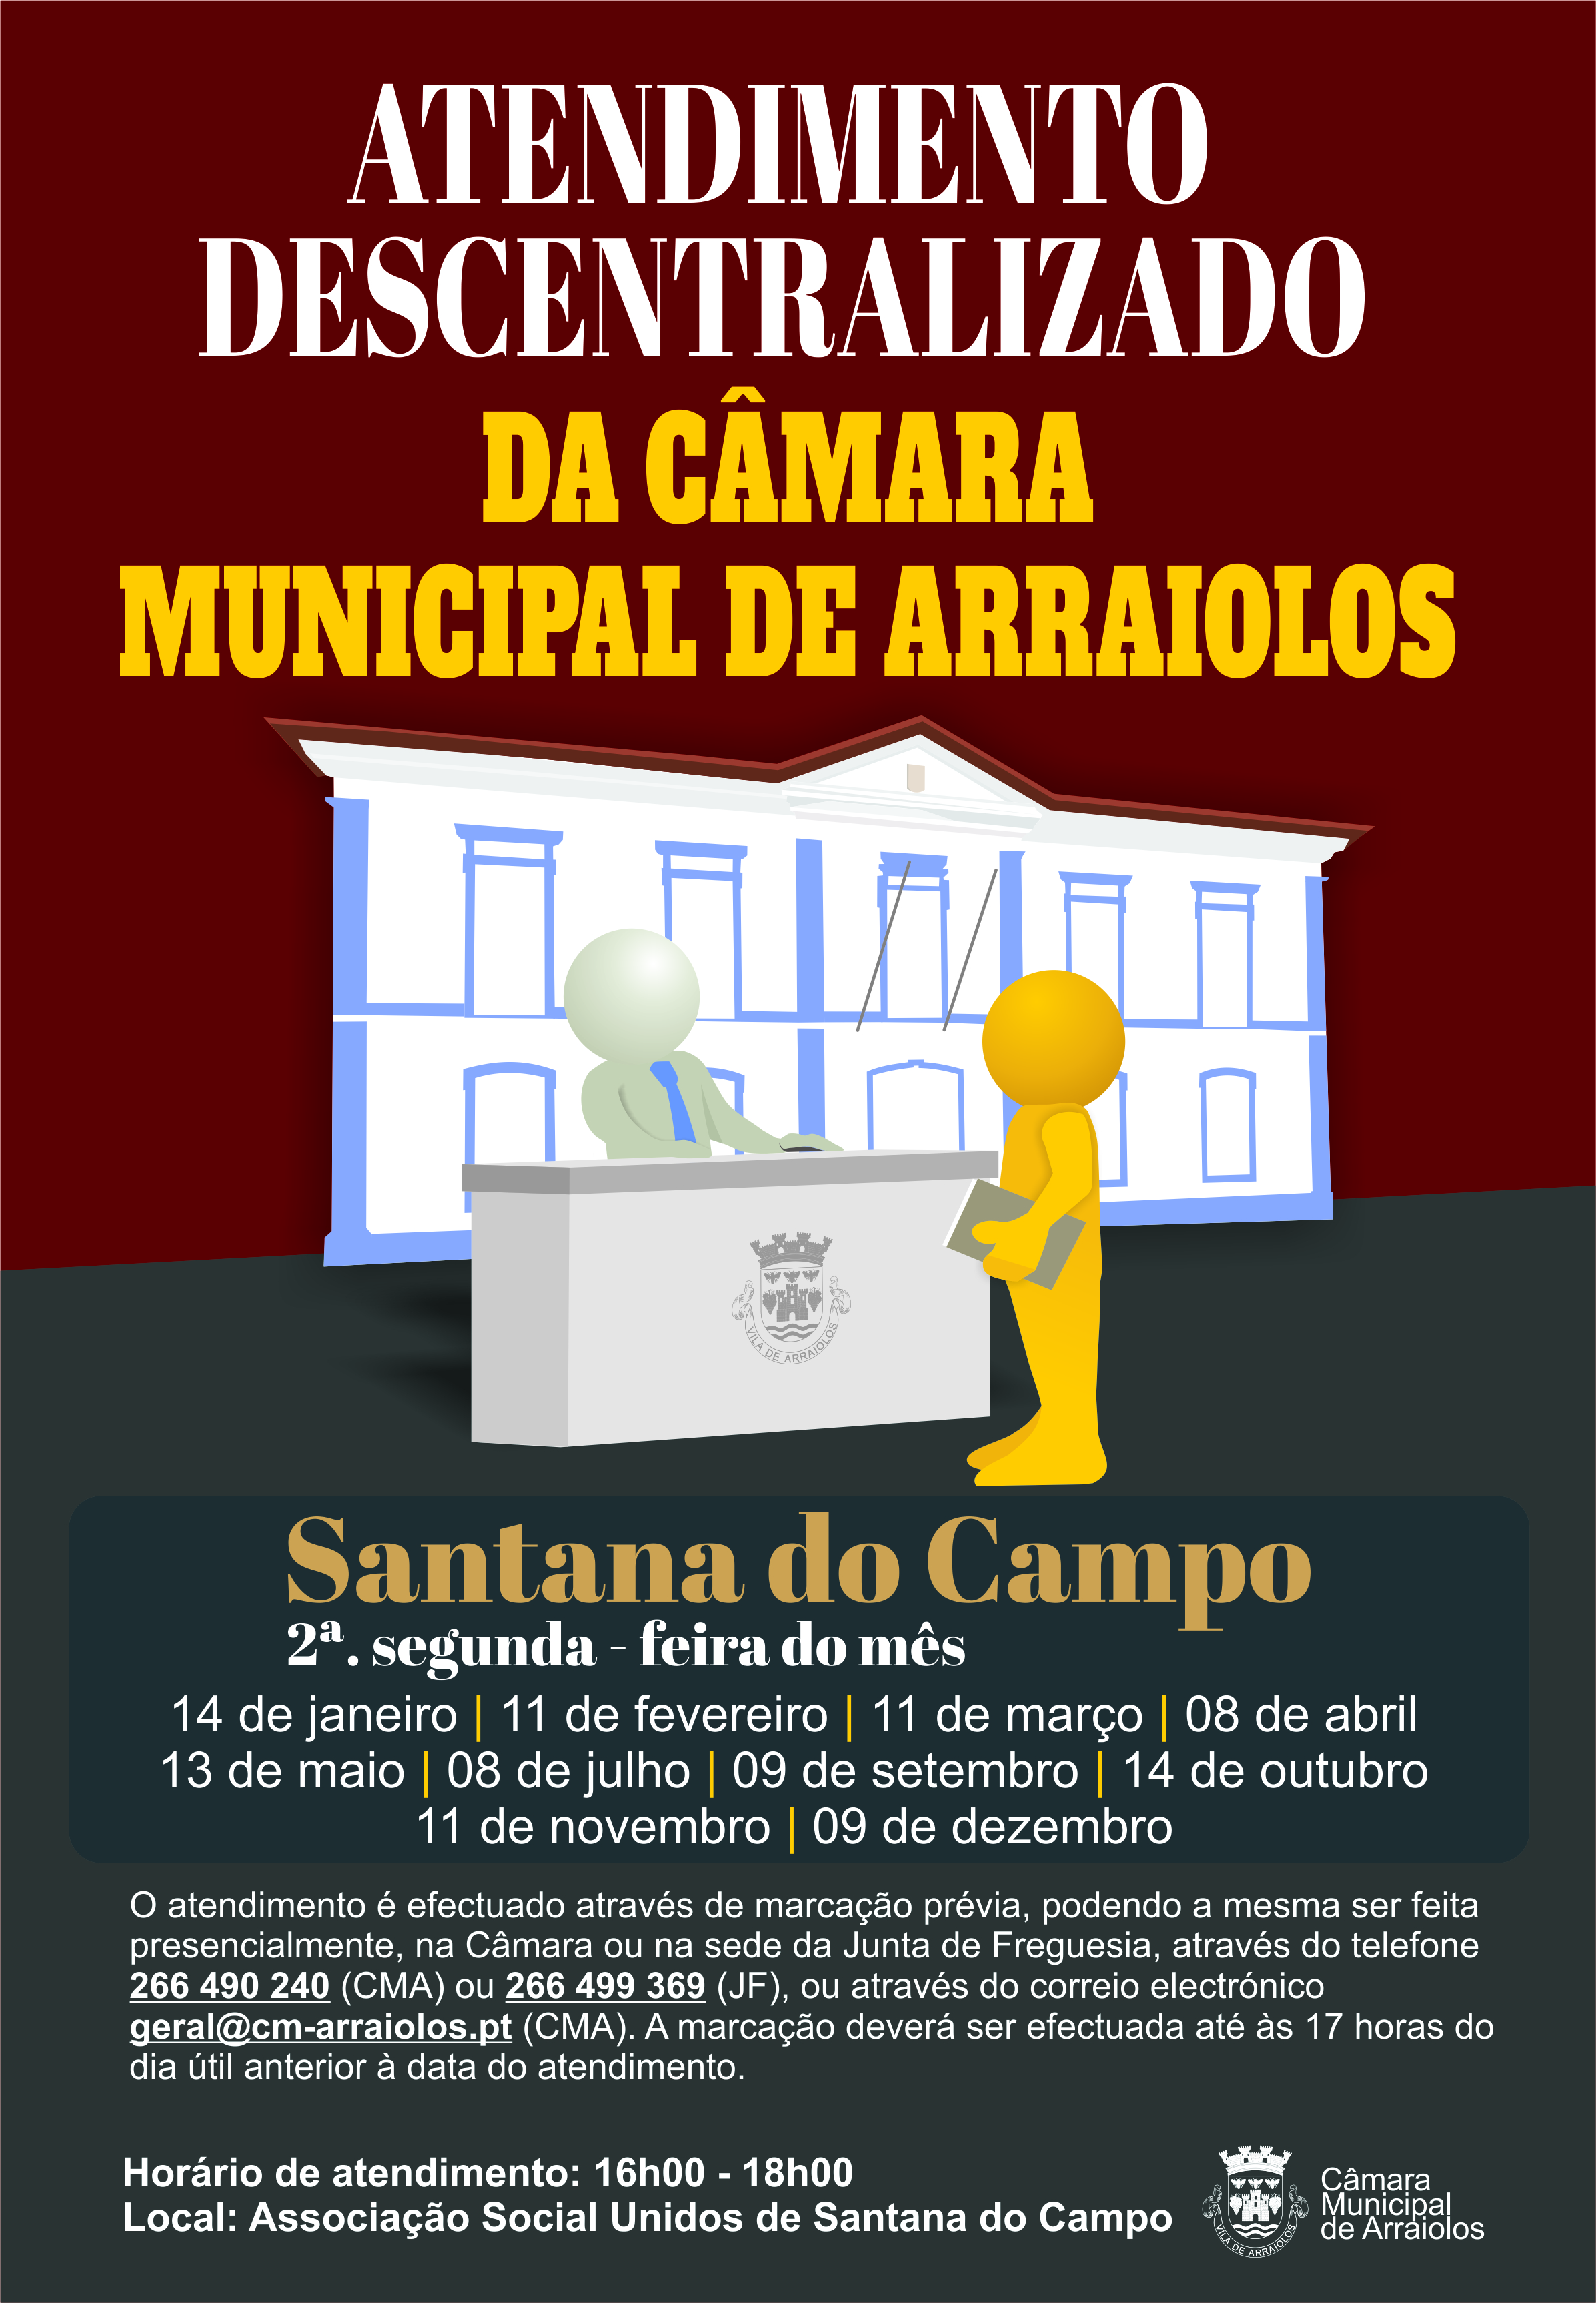 Atendimento Descentralizado 2019 Santana.jpg